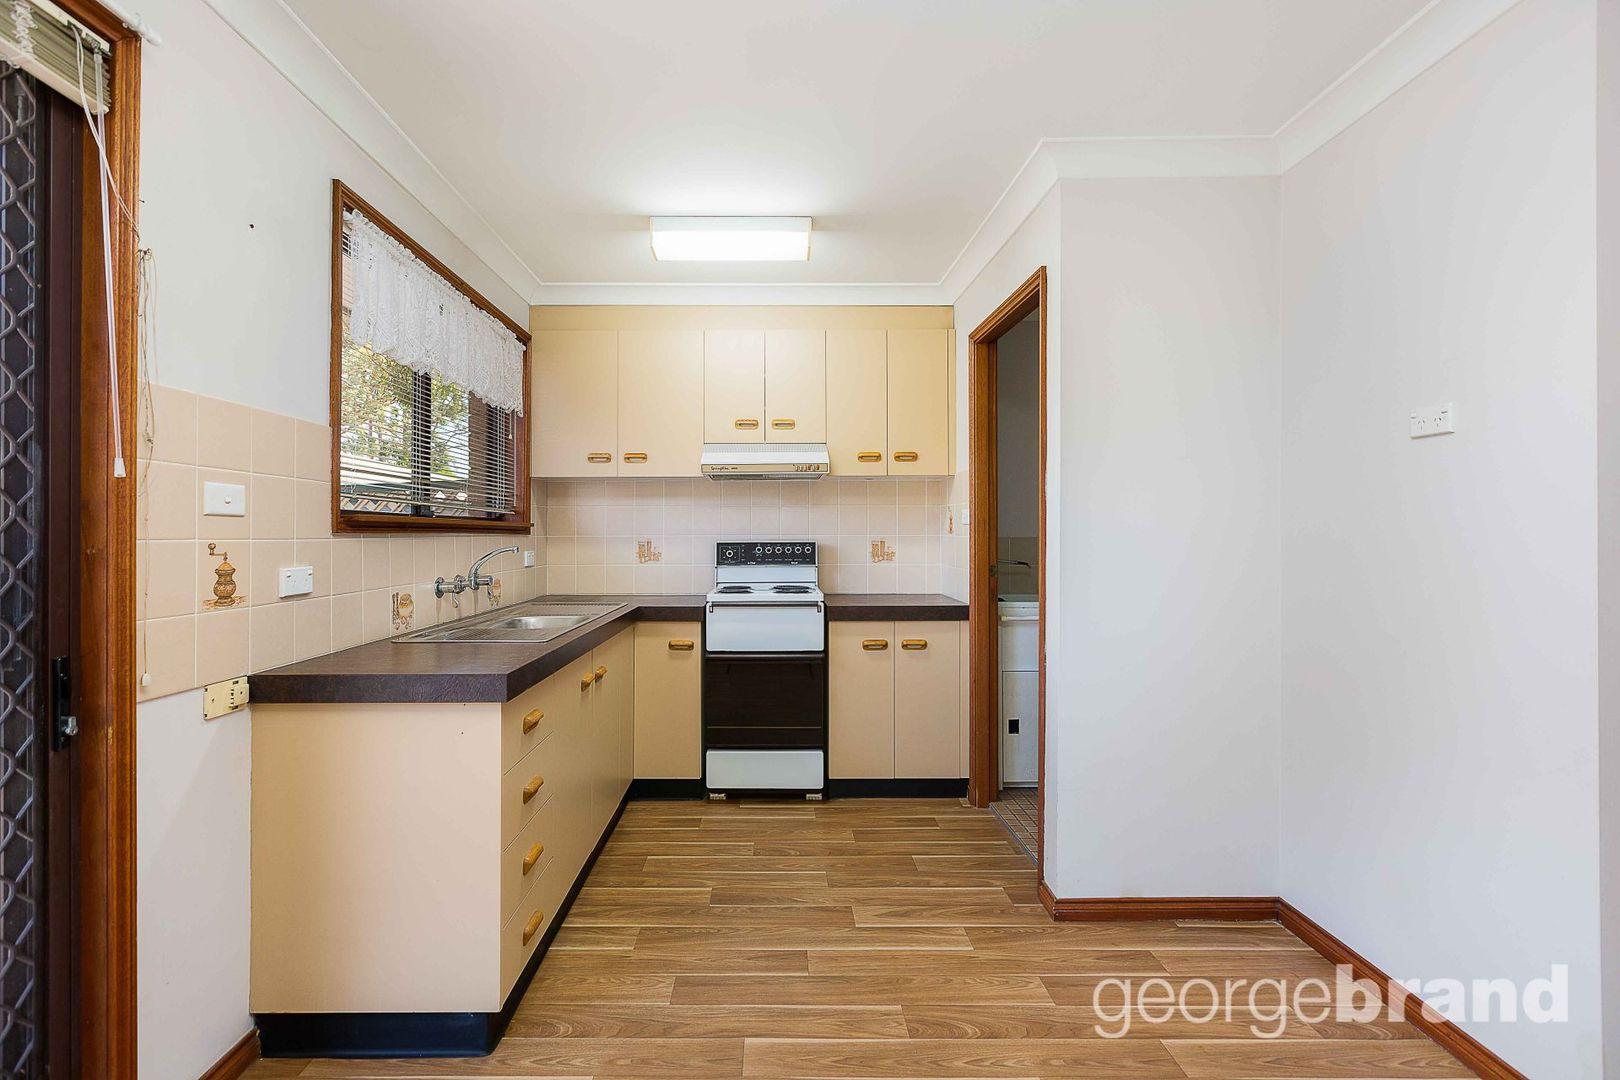 16/255 Main Road, Toukley NSW 2263, Image 1